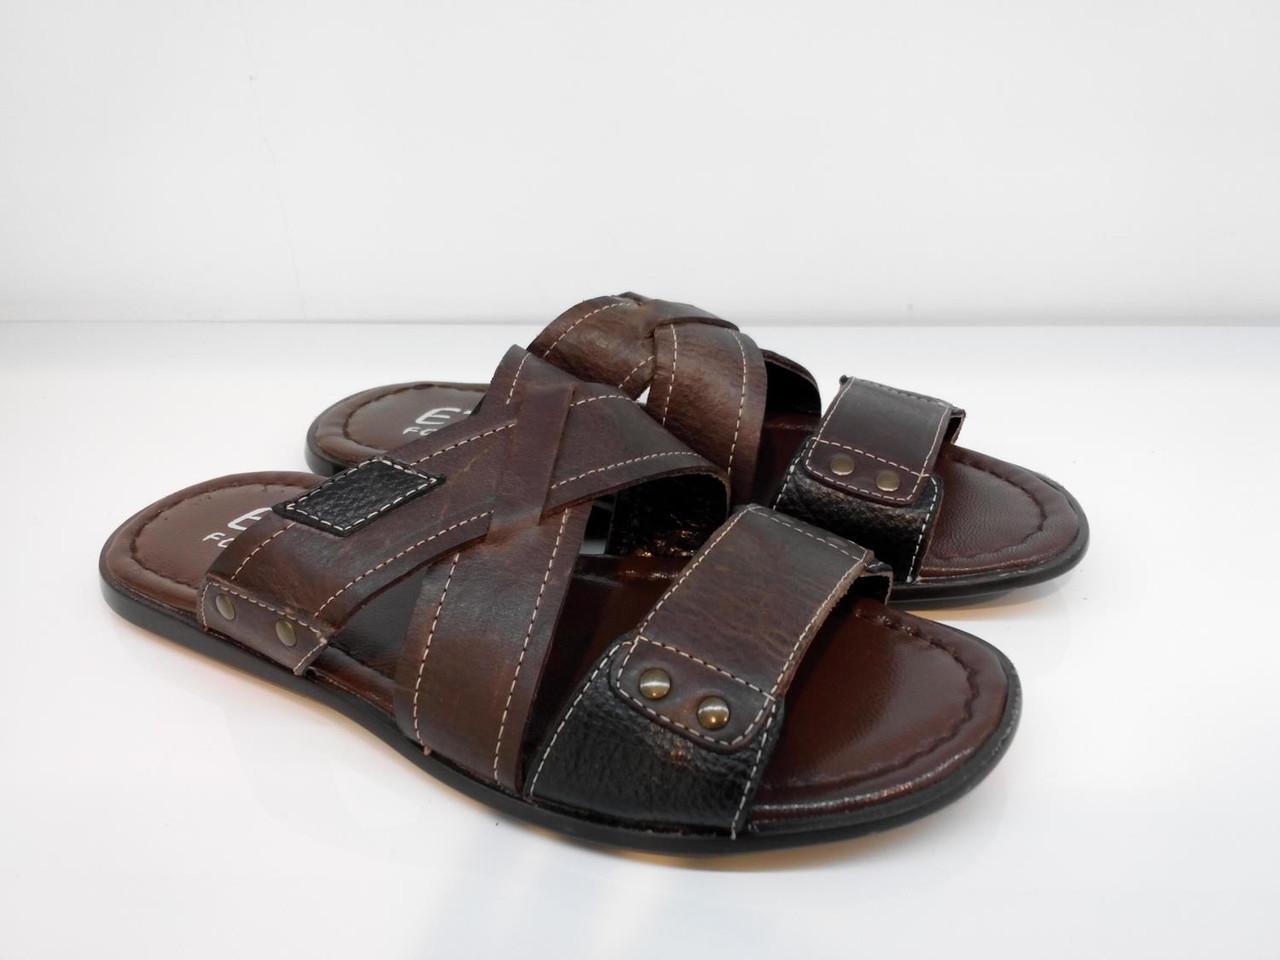 Шлепанцы Etor 578-3715-013 44 коричневые